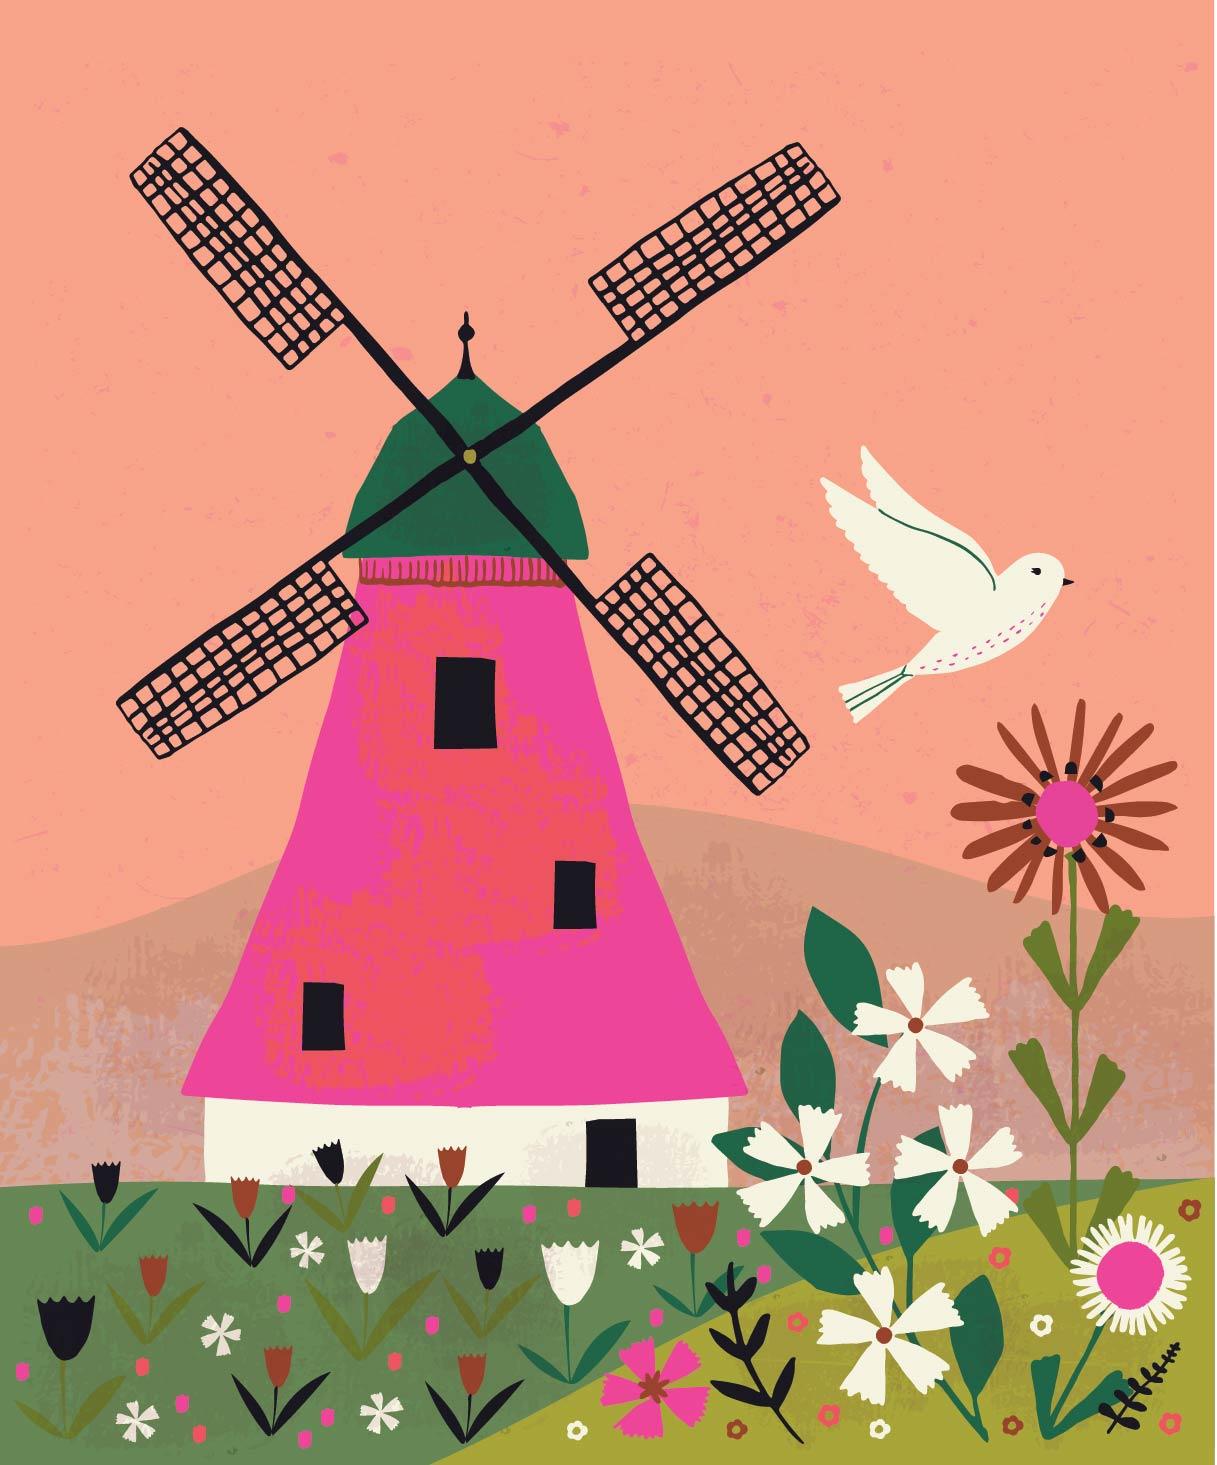 tara_PP_Windmill_Sunrise.jpg